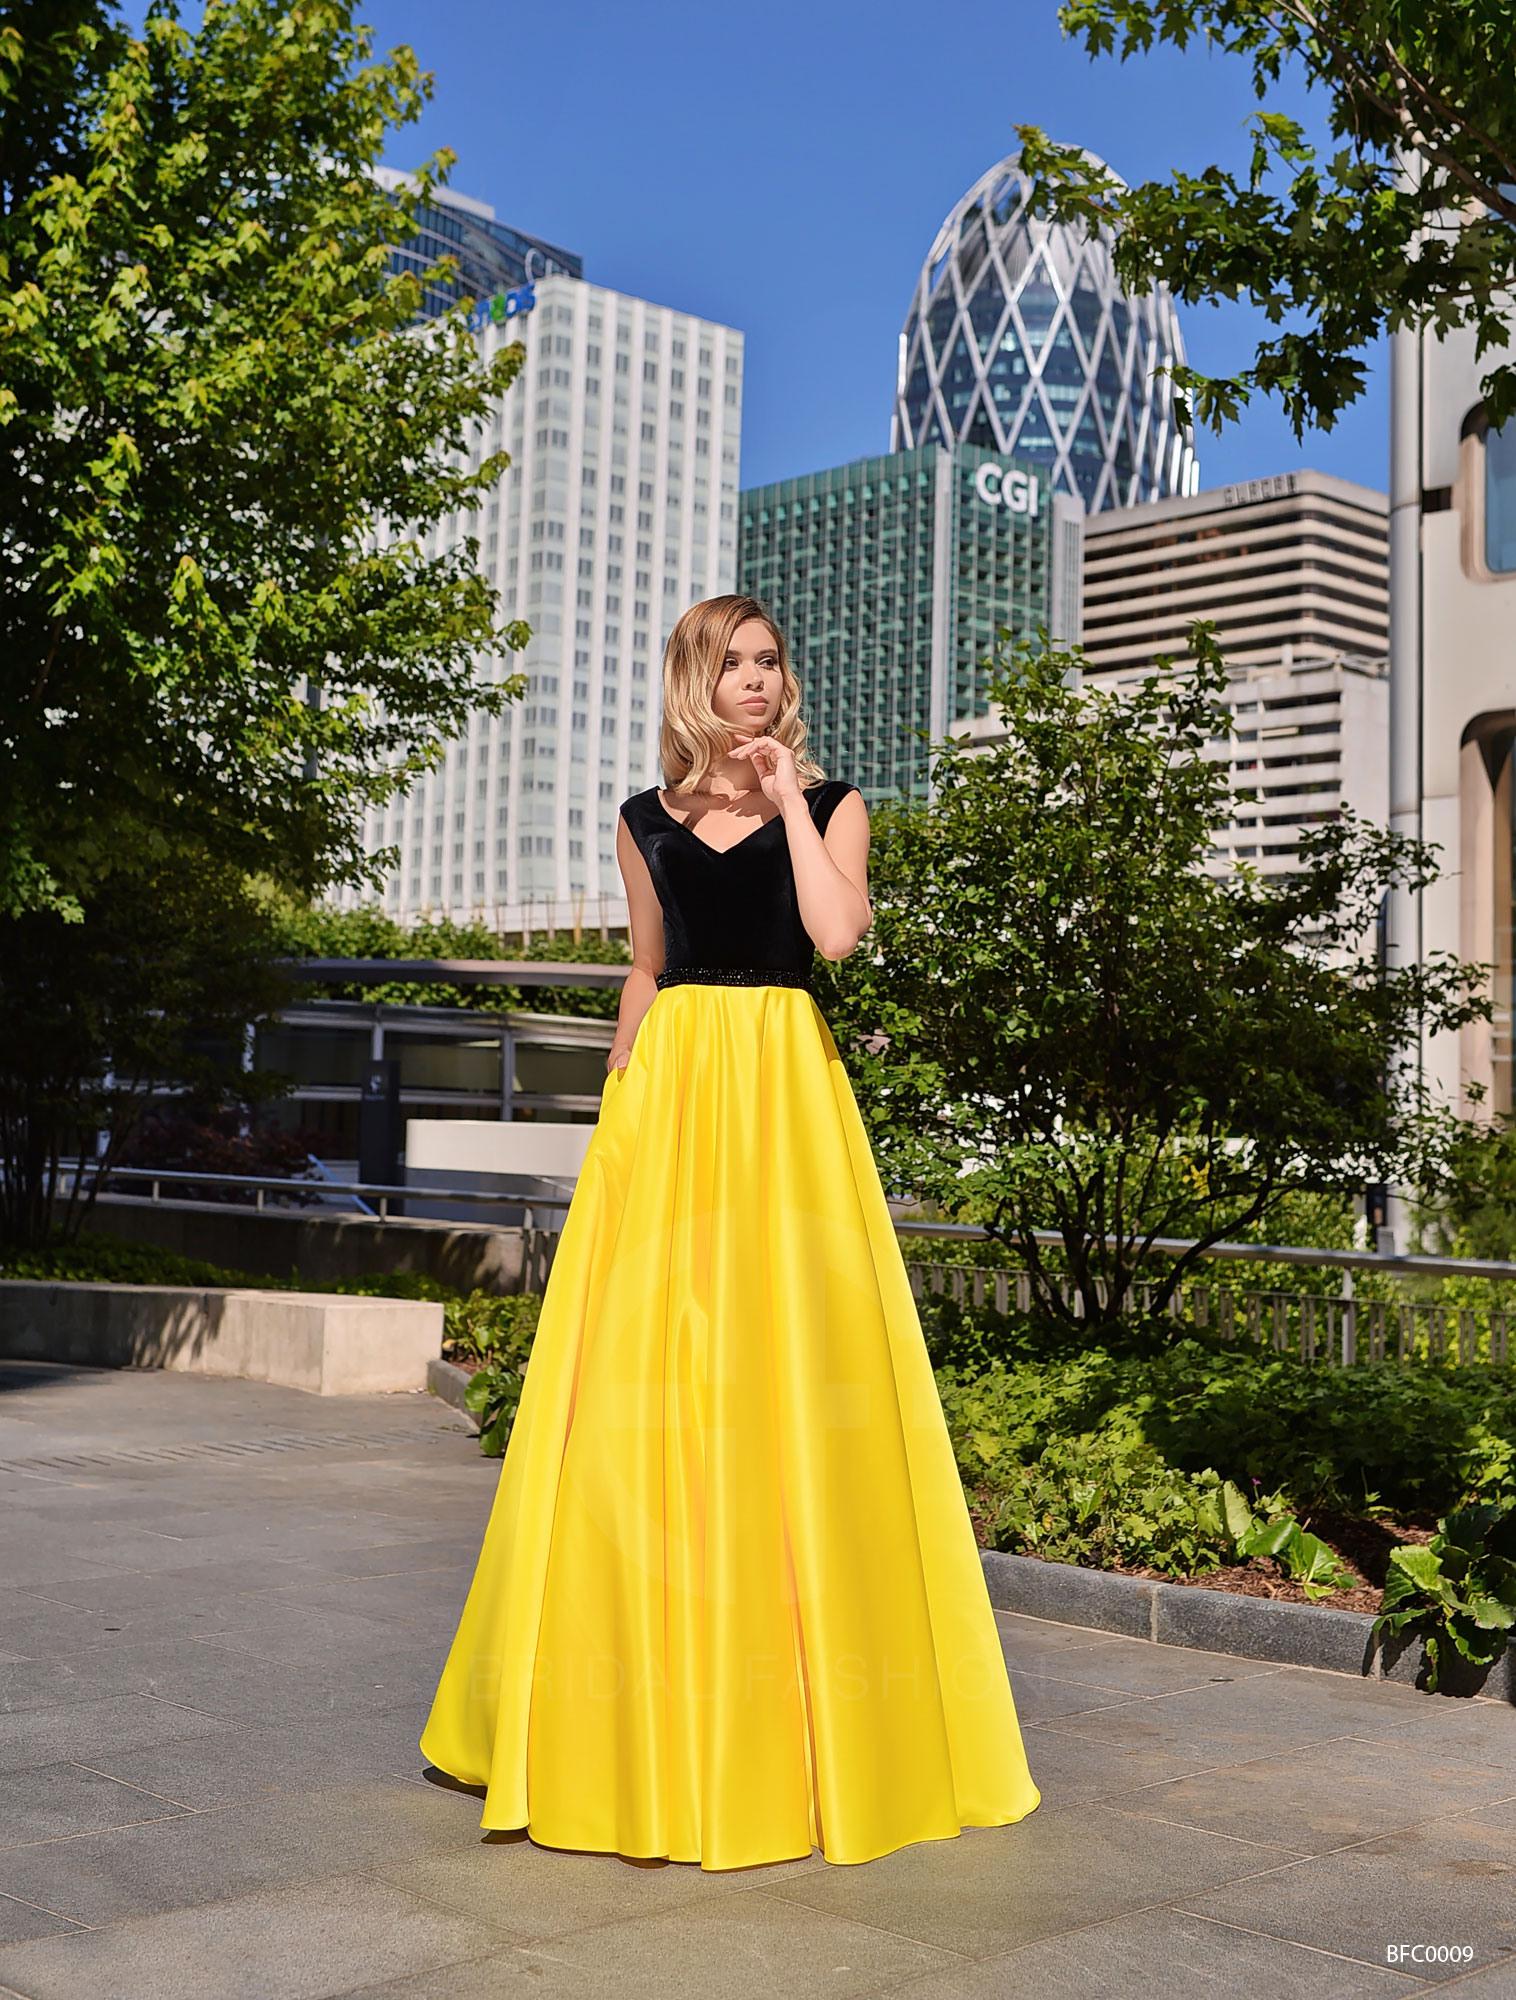 17 Genial Elegante Abendkleidung Design20 Genial Elegante Abendkleidung für 2019